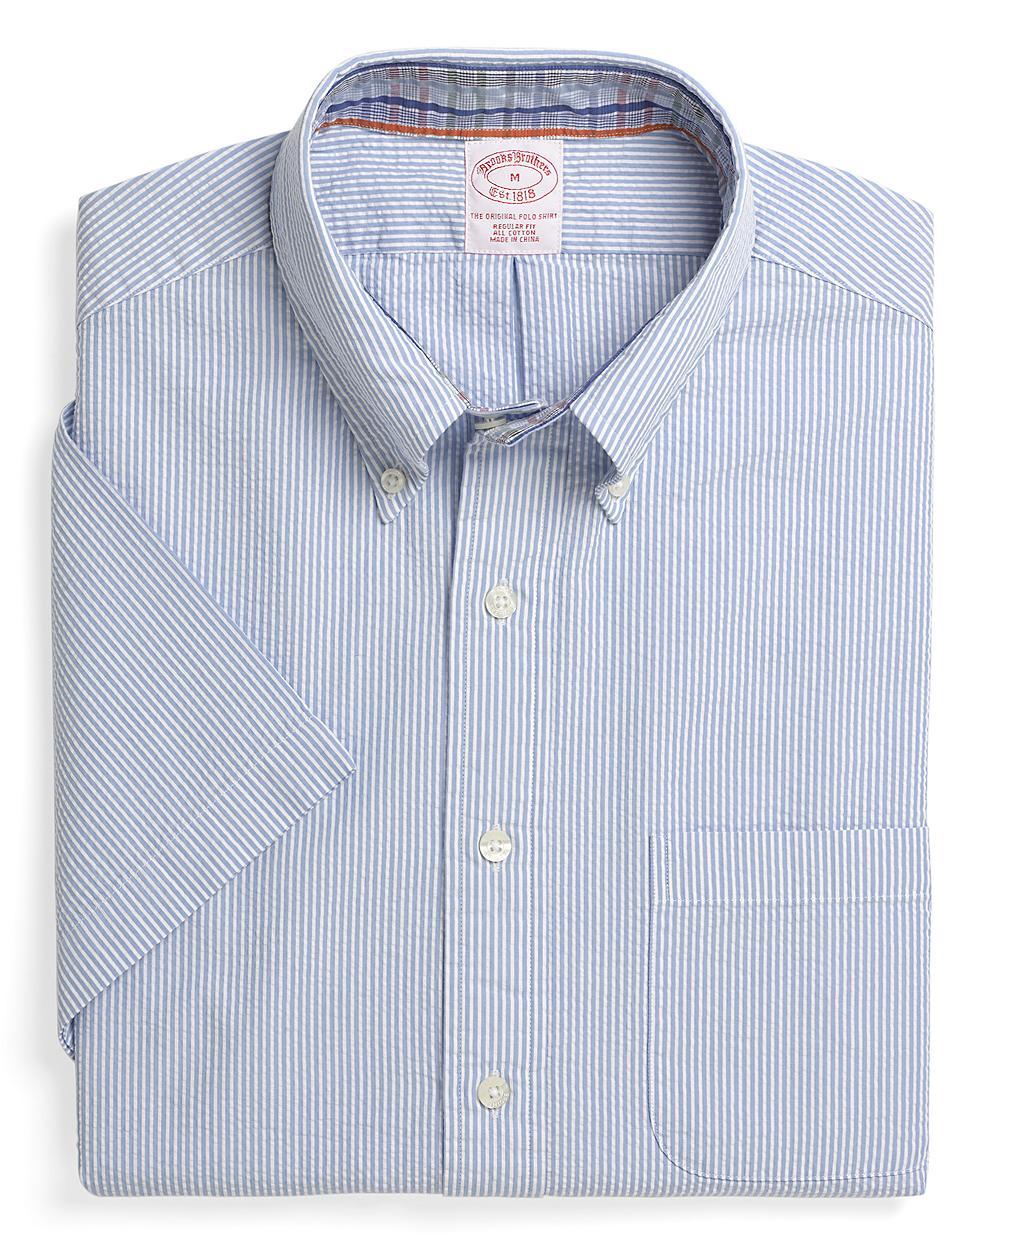 Brooks brothers regular fit short sleeve stripe seersucker for Brooks brothers dress shirt fit guide